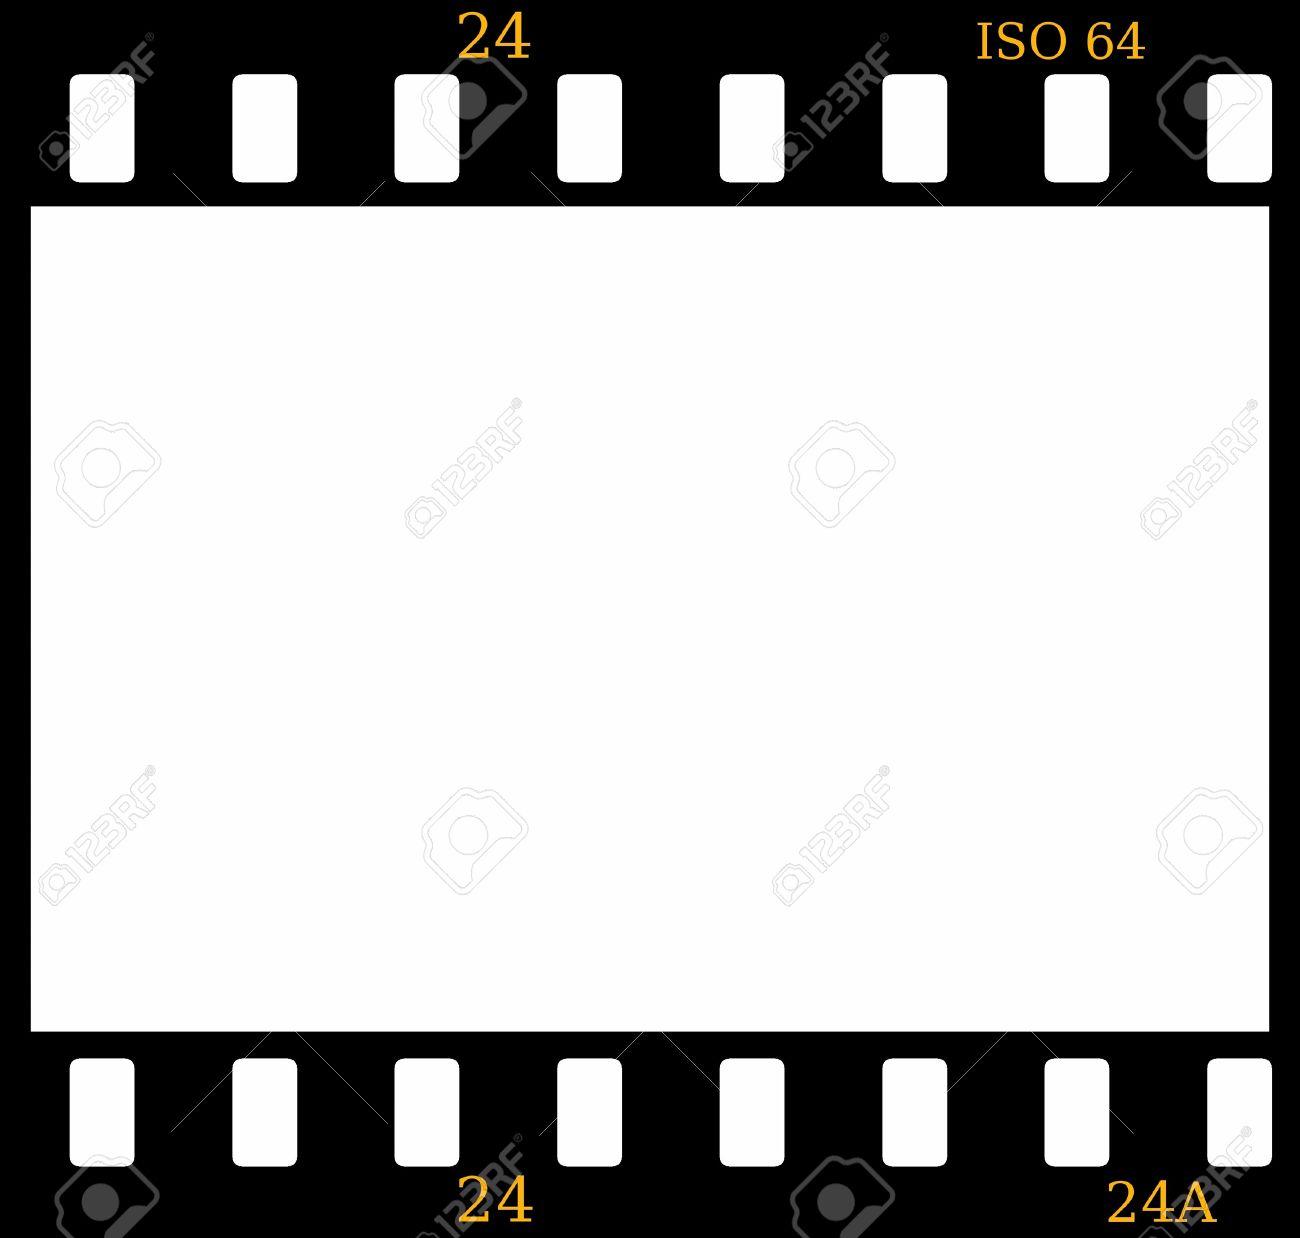 35mm Color Positive Slide Film Frame Isolated On White Stock Photo